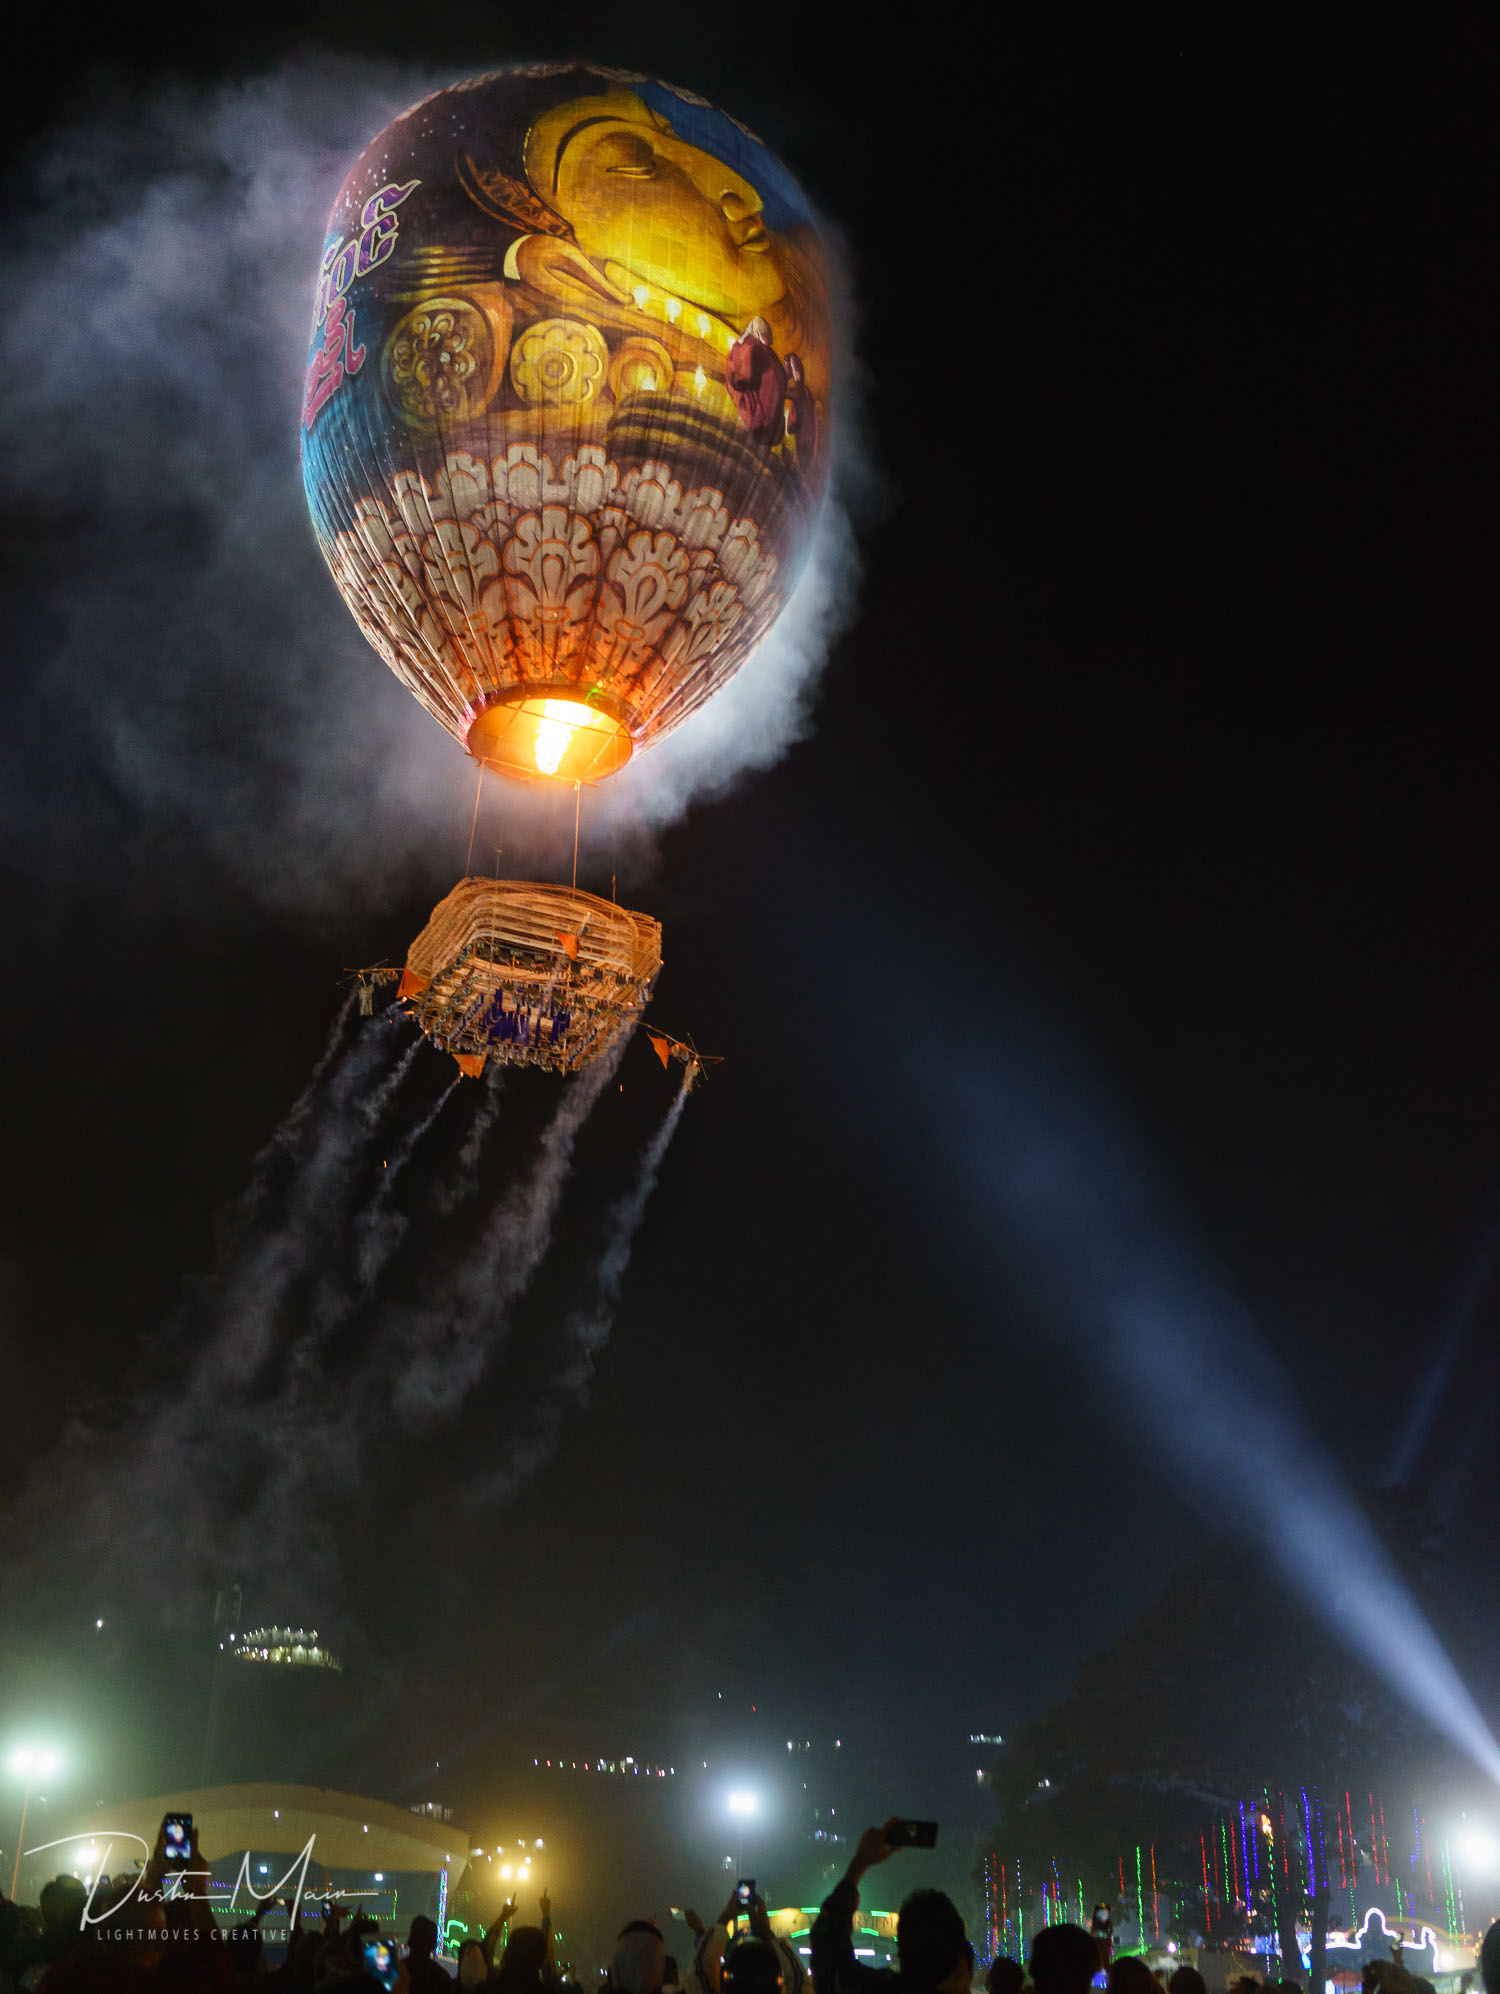 Nya Mee Gyi takes off at the Tazaungdaing Fire Balloon Festival  © Dustin Main 2015